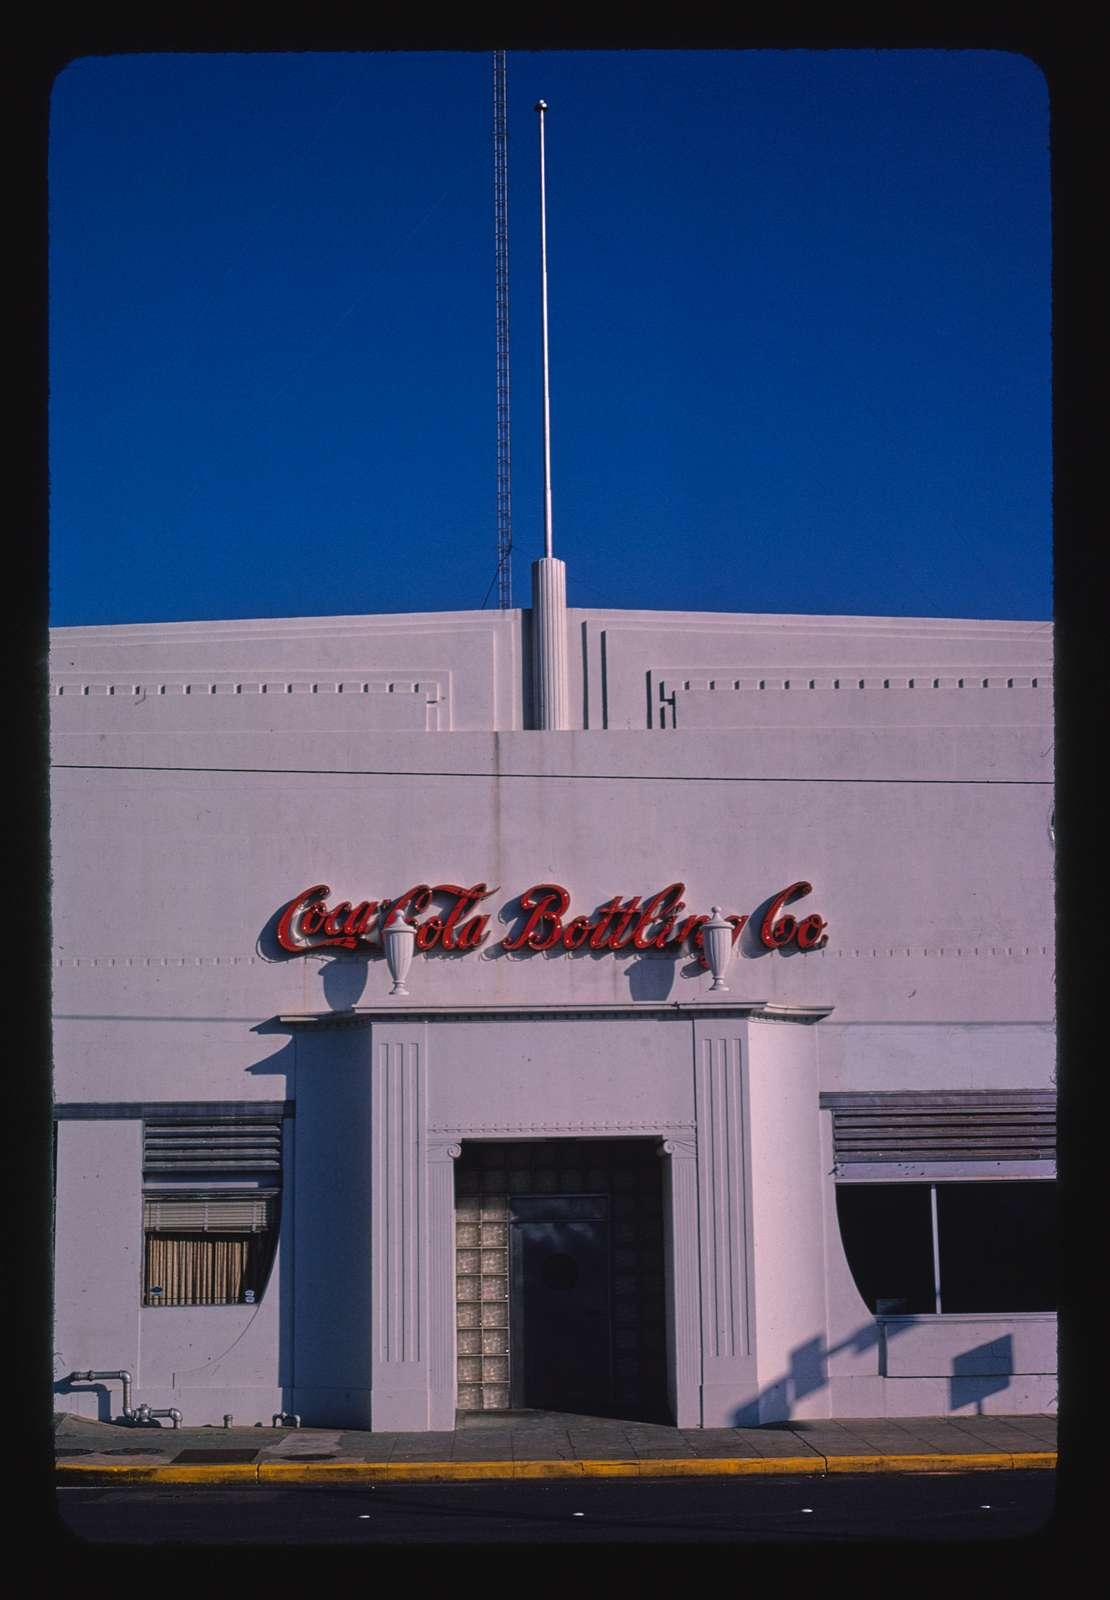 Coca Cola Bottling Company, vertical entrance detail, 12th & Austin, Waco, Texas